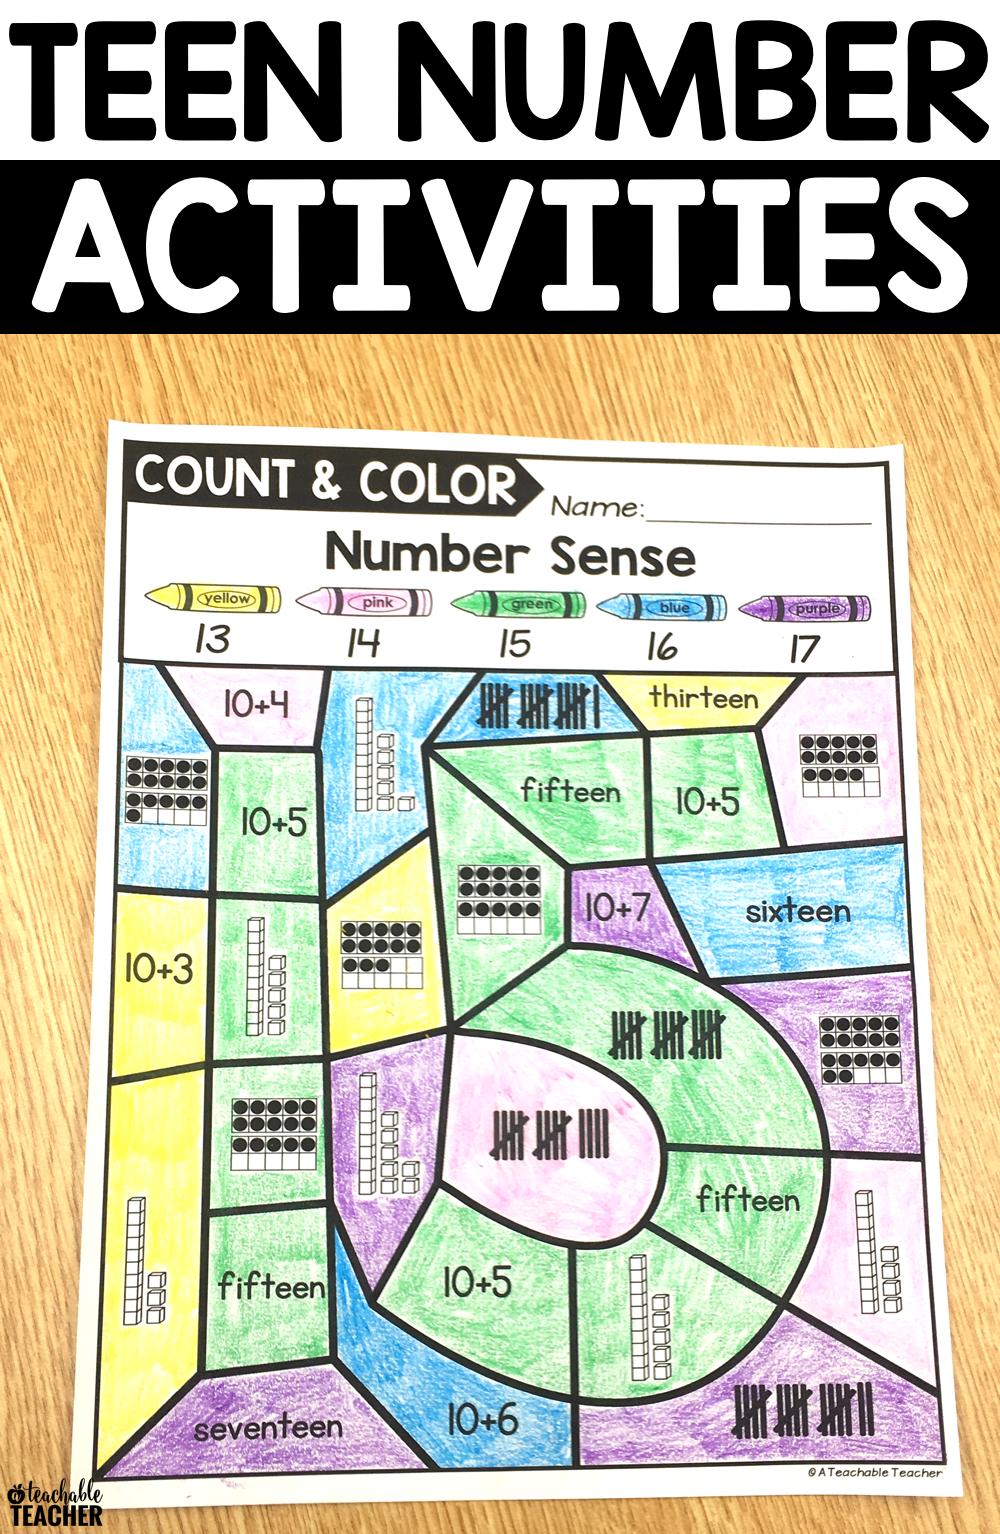 Color By TEEN Number Sense Activities | Teen numbers, Number ...